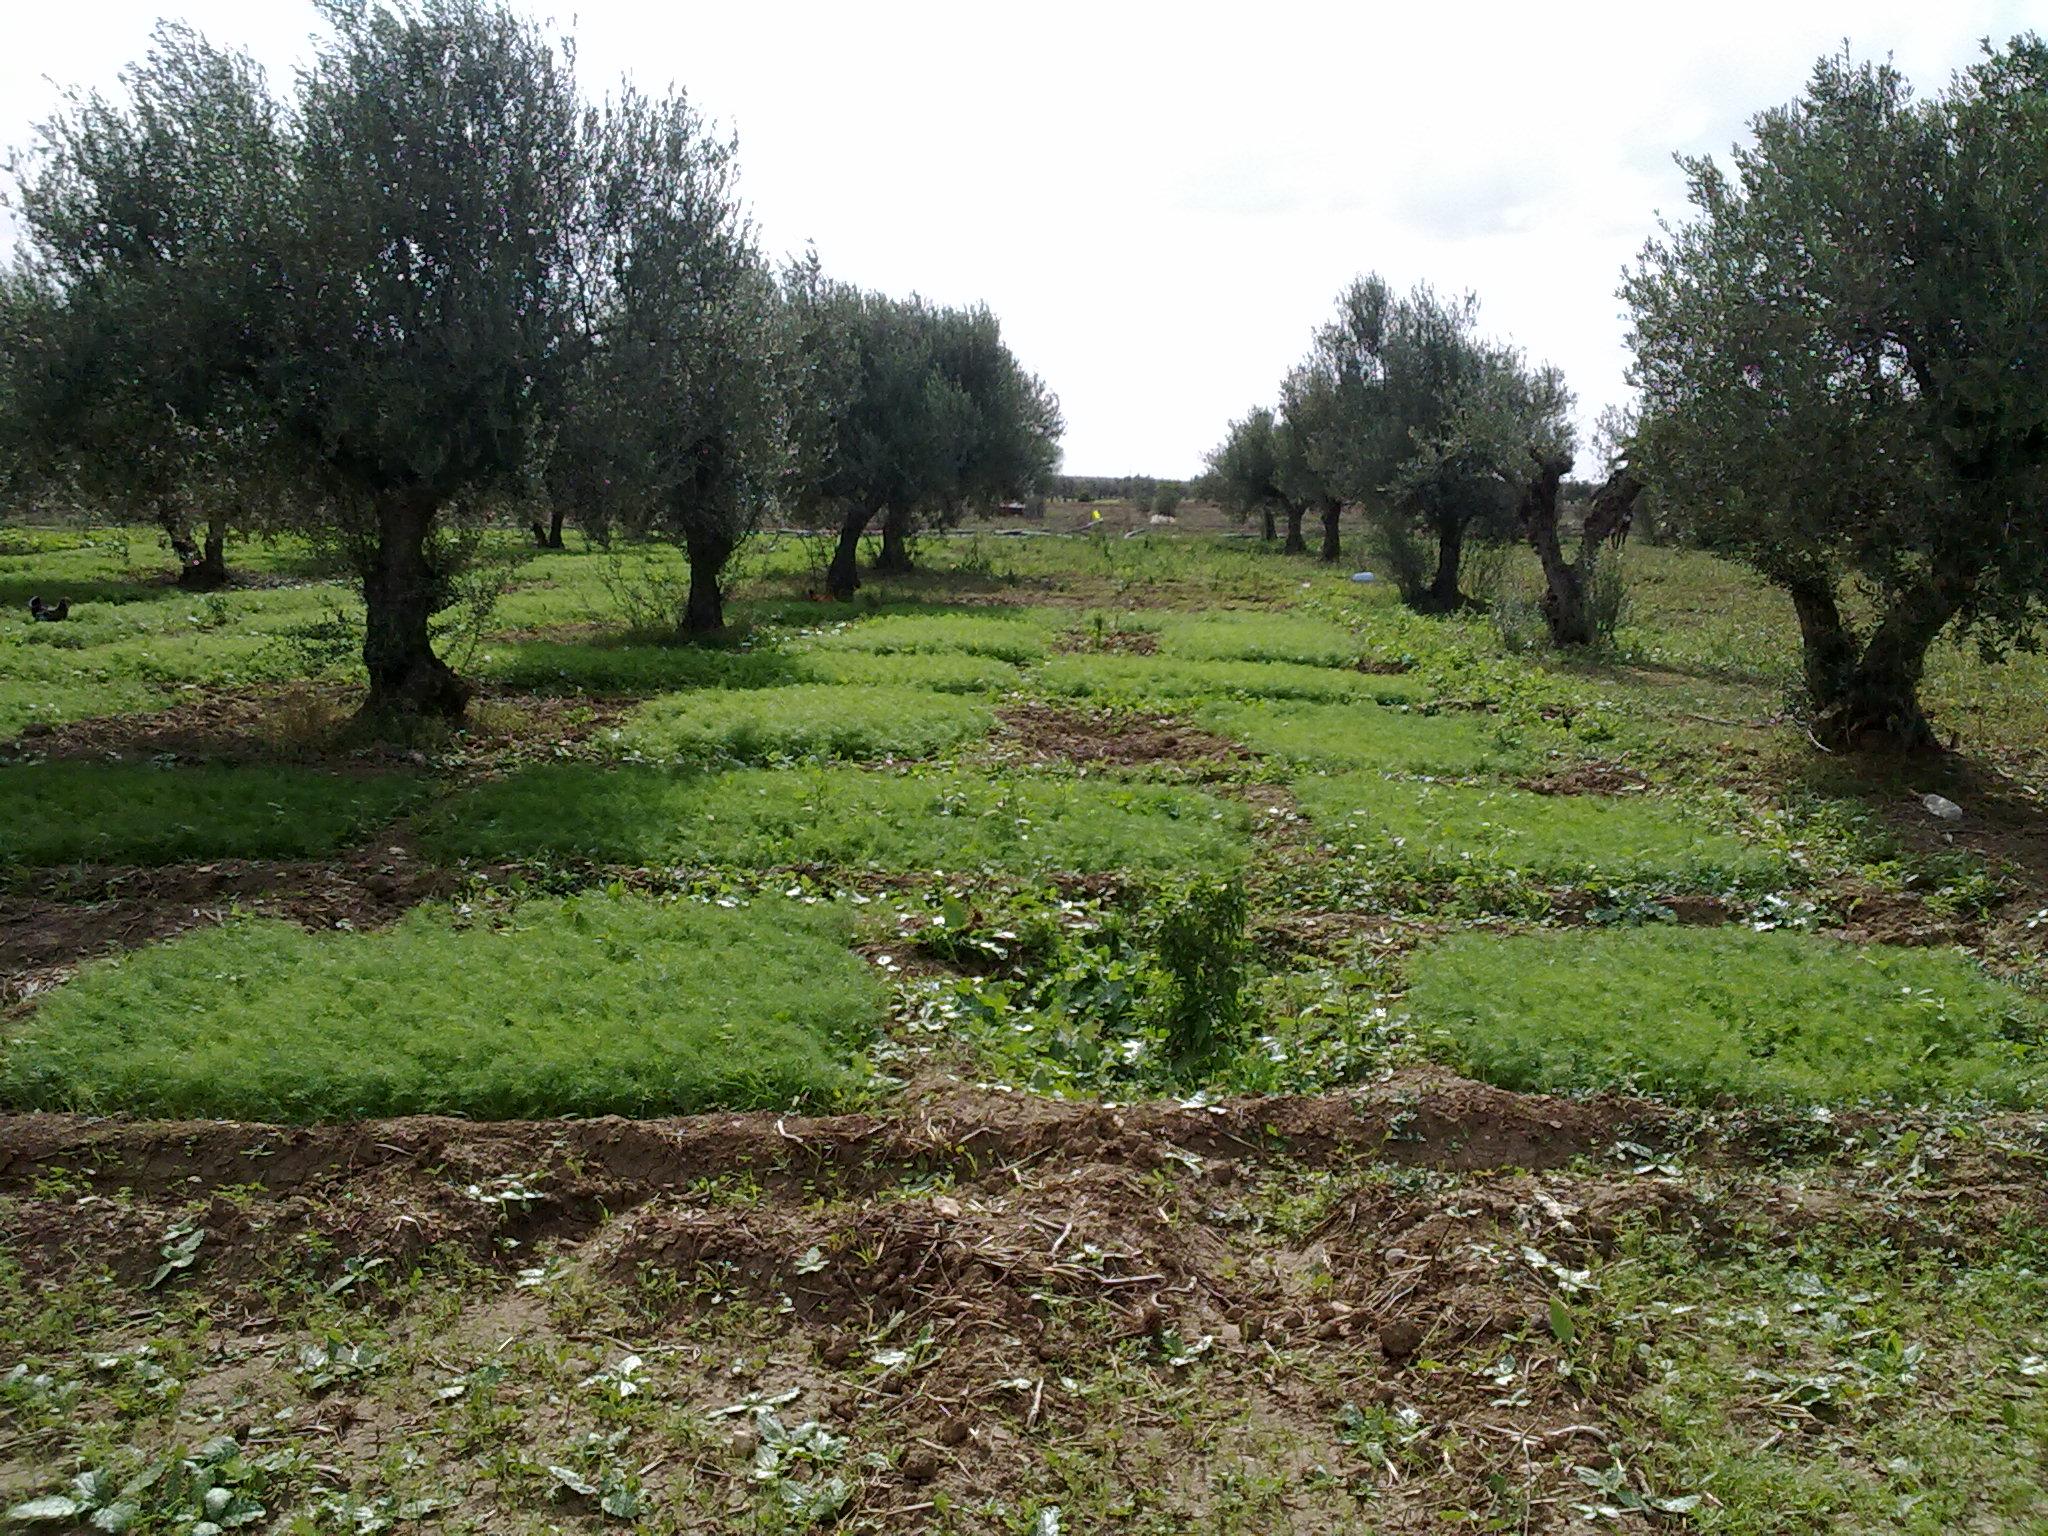 Vente terrain agricole borj el amri tunisi tunisie for Agrandissement maison terrain agricole